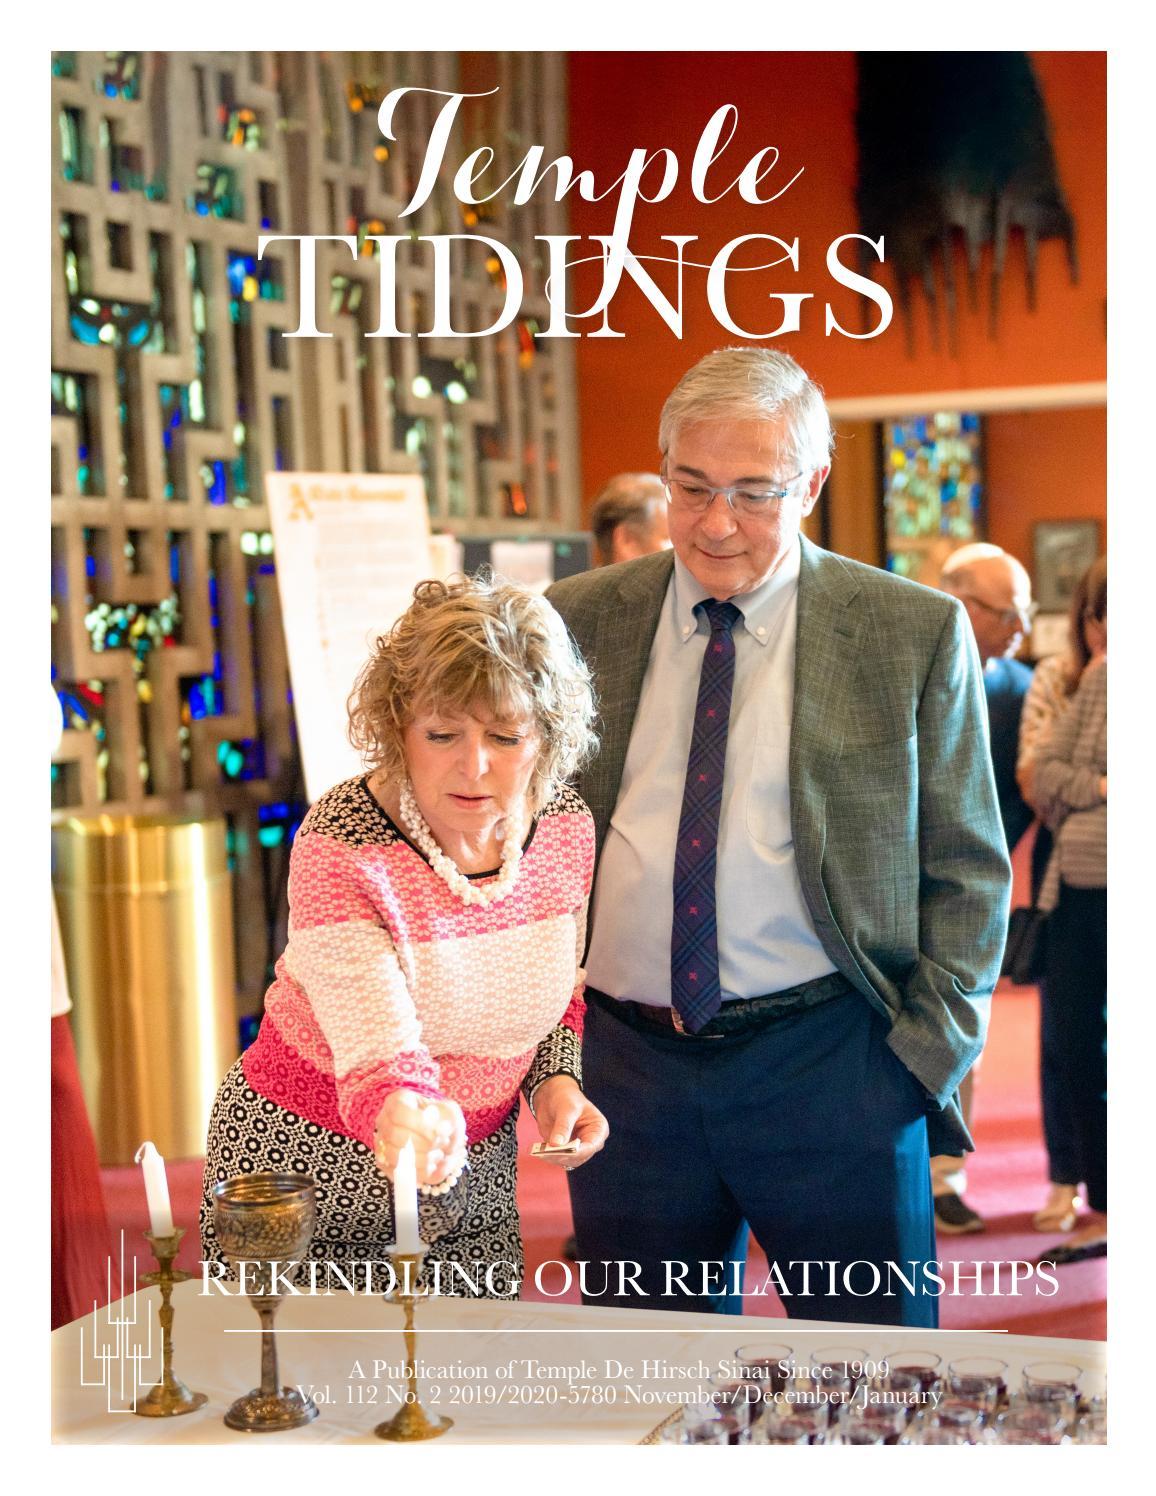 Barbara Bush Craft Fair 2020.Temple Tidings Vol 112 No 2 2019 2020 5780 November